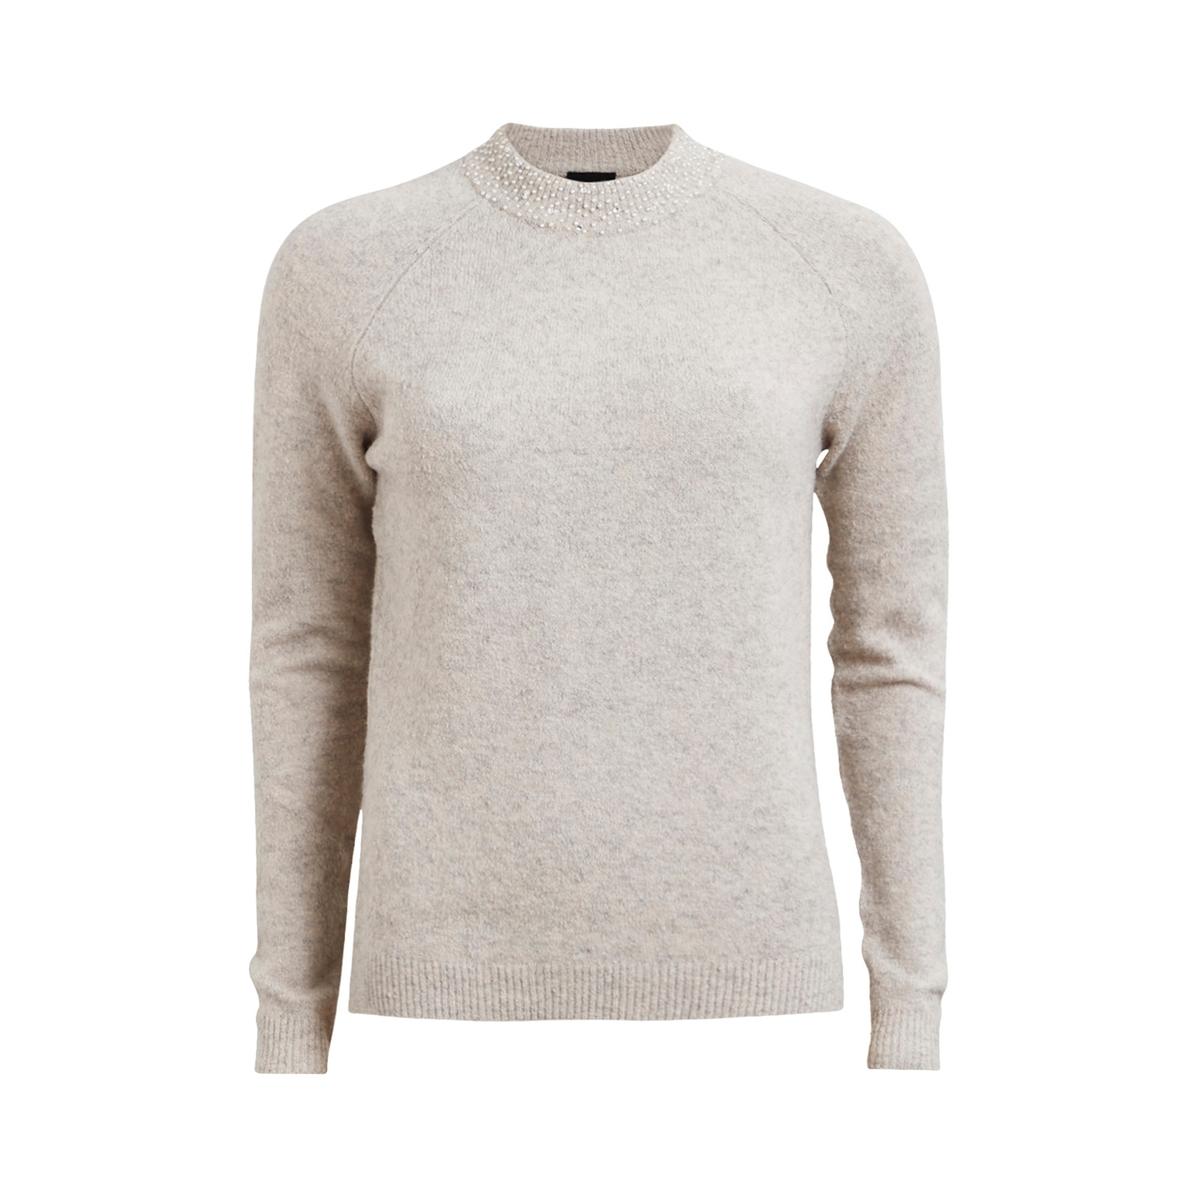 Пуловер со стоячим воротником VIGRADED KNIT TOP